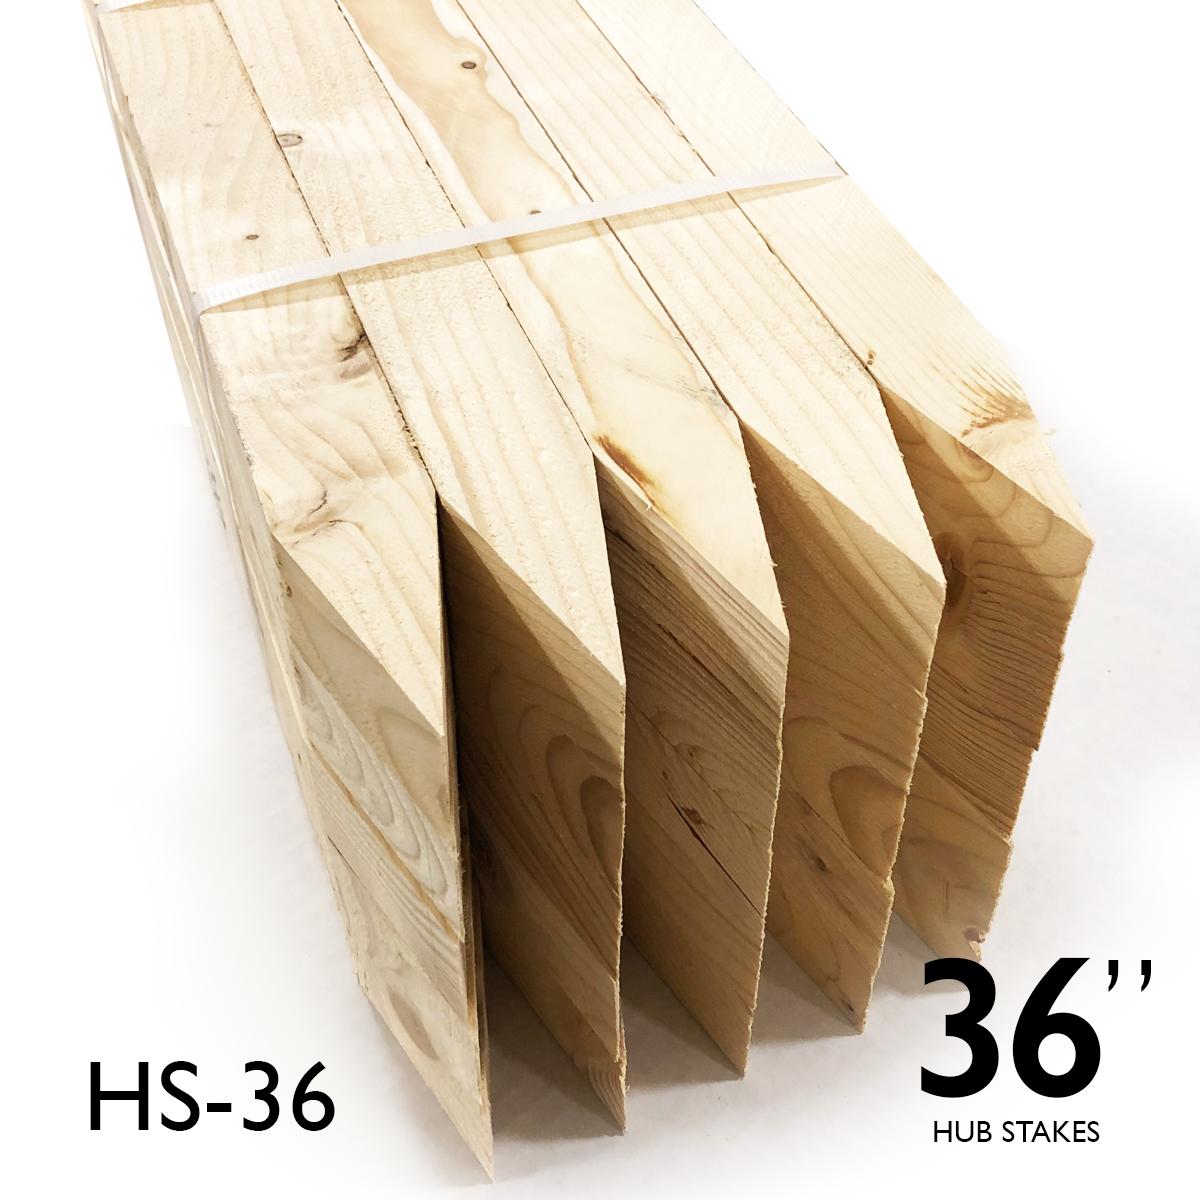 "Hub Stakes 2 X 2 X 36"" FULL Pallet"